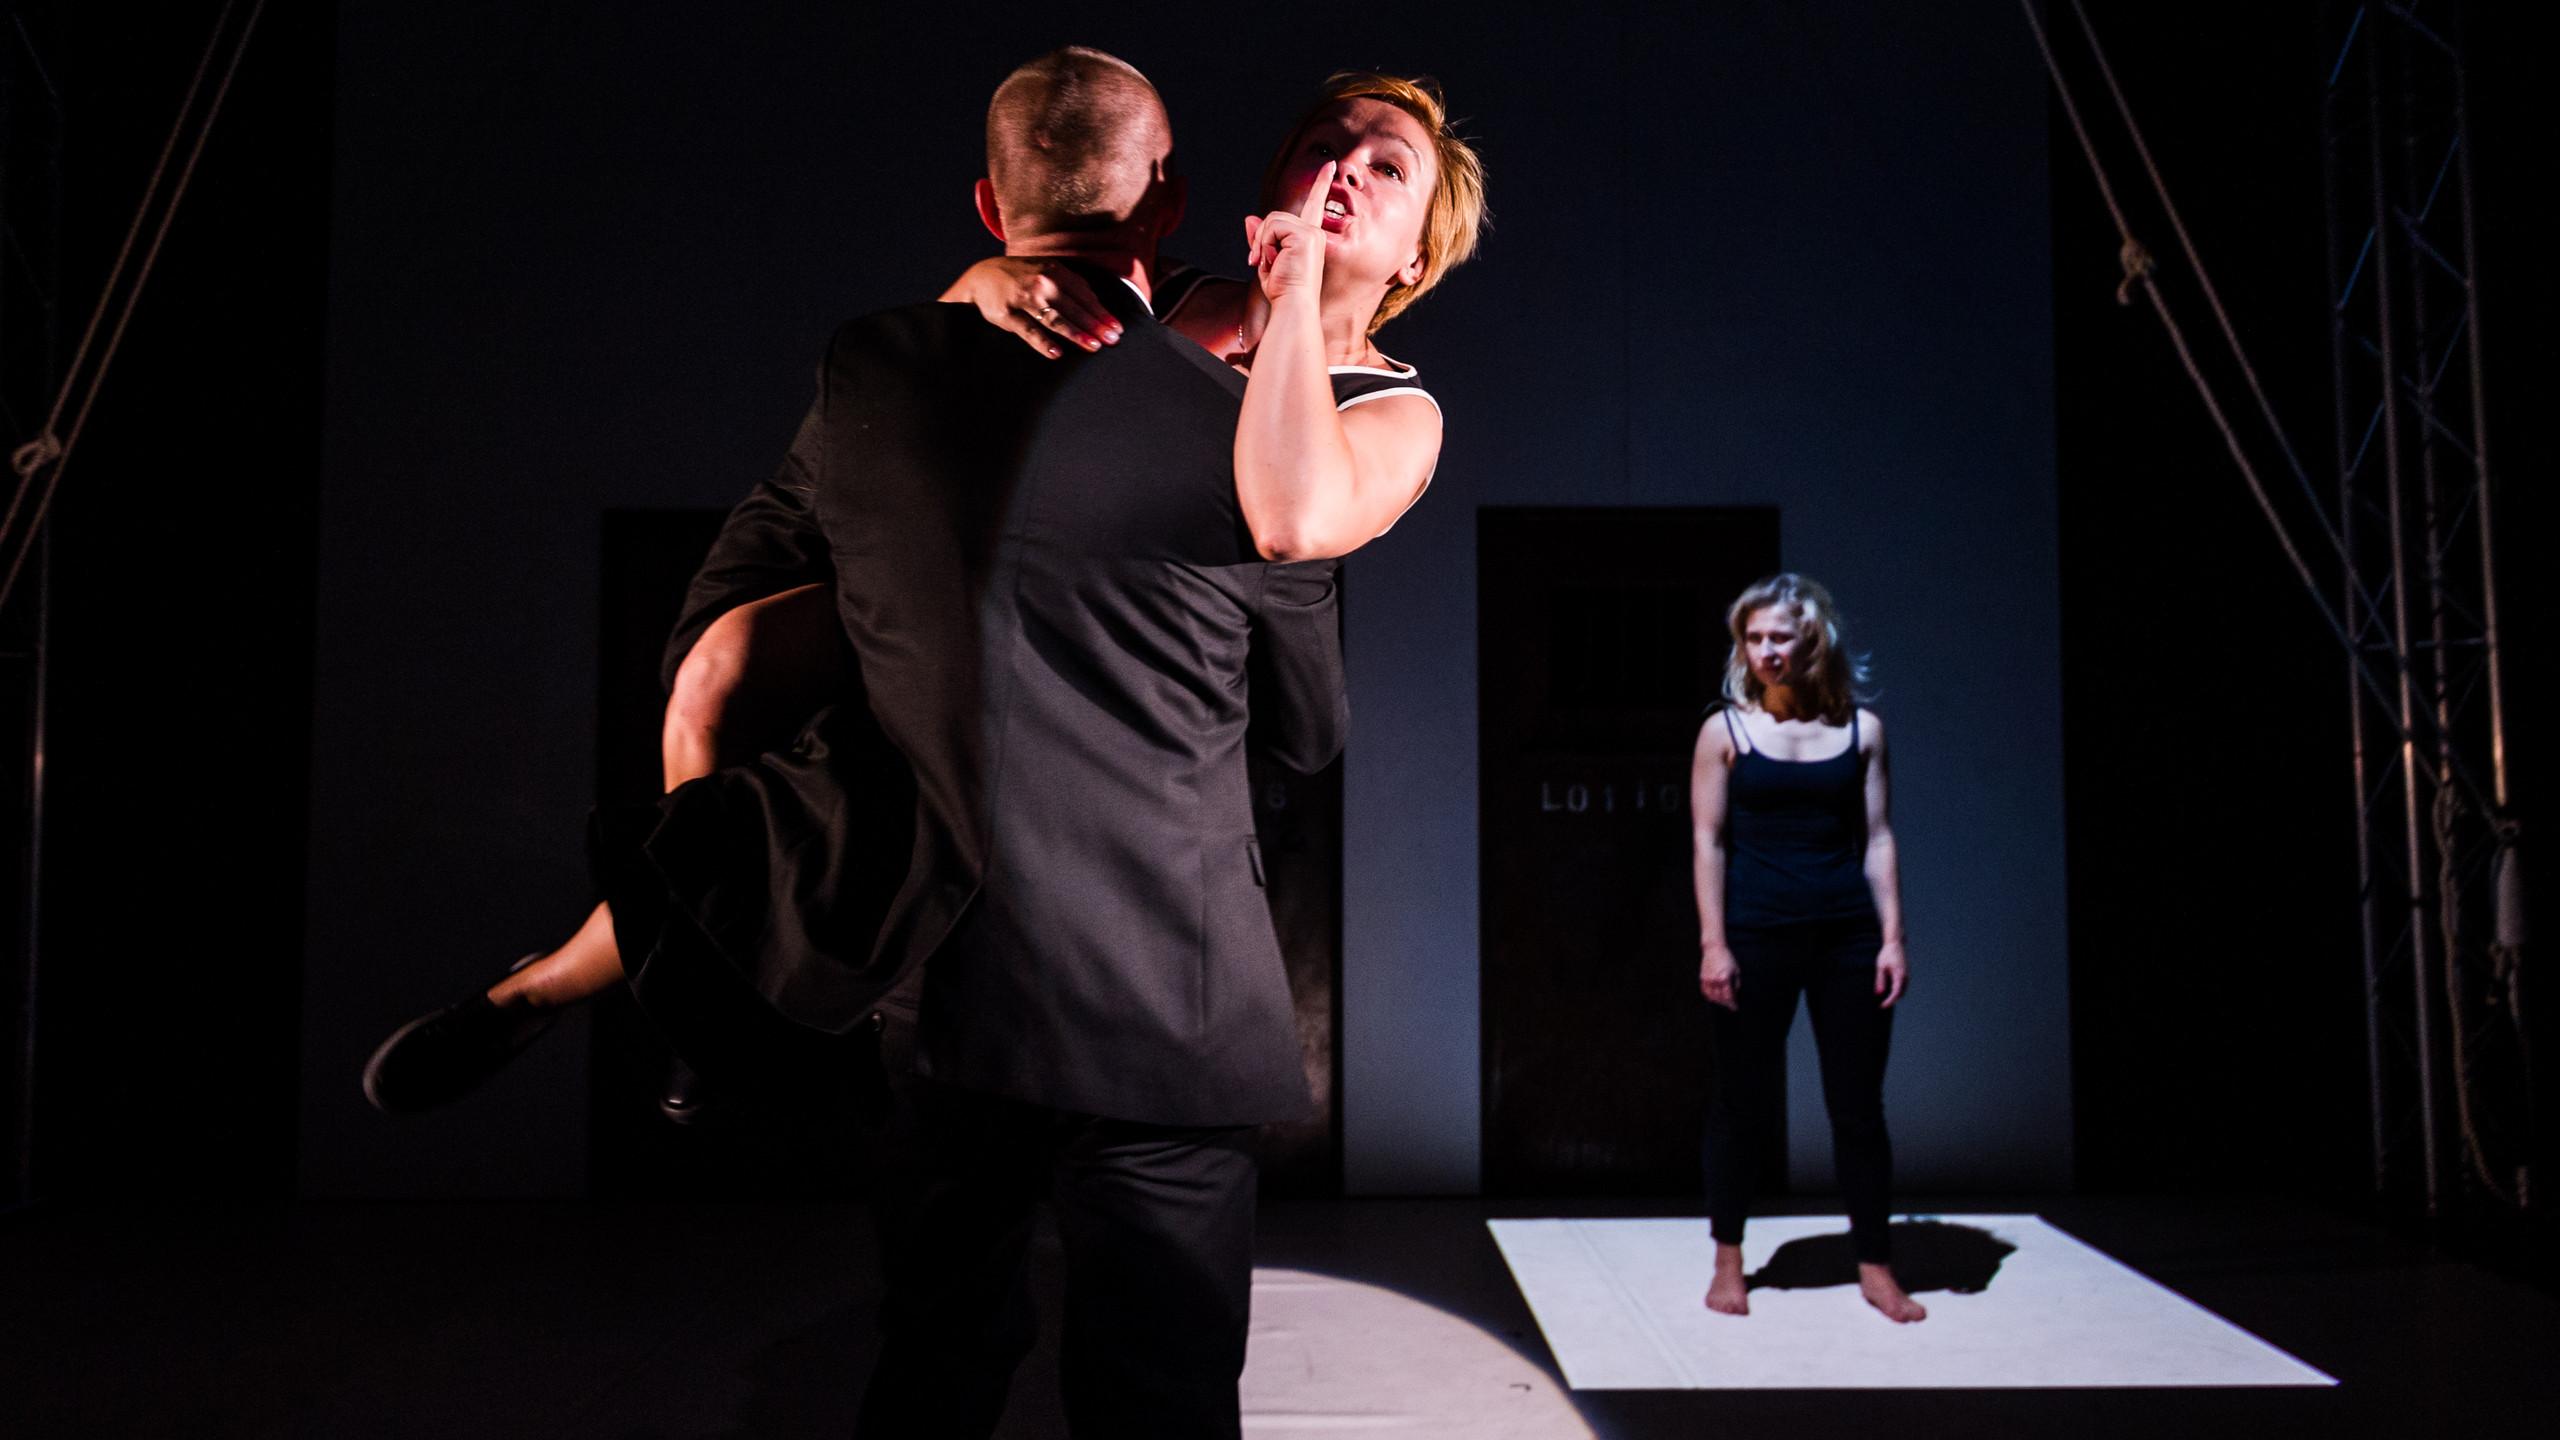 (c) Alex Brenner, Belarus Free Theatre - Burning Doors. Kiryl Kanstantsinau, Maryna Yurevich and Maria Alyokhina